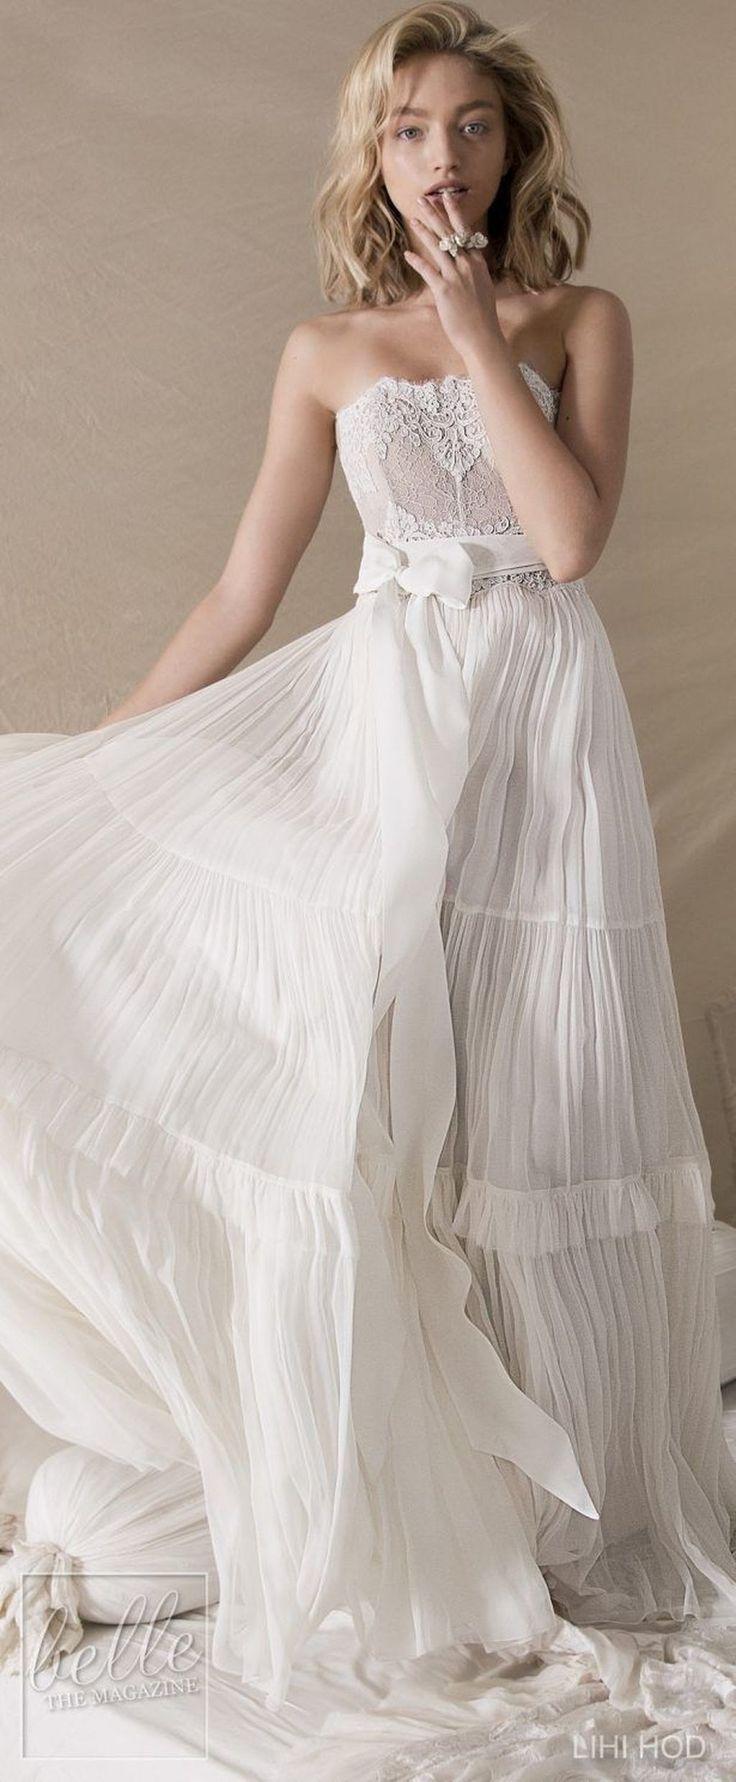 The 84 best BRAUTMODE images on Pinterest | Wedding frocks ...